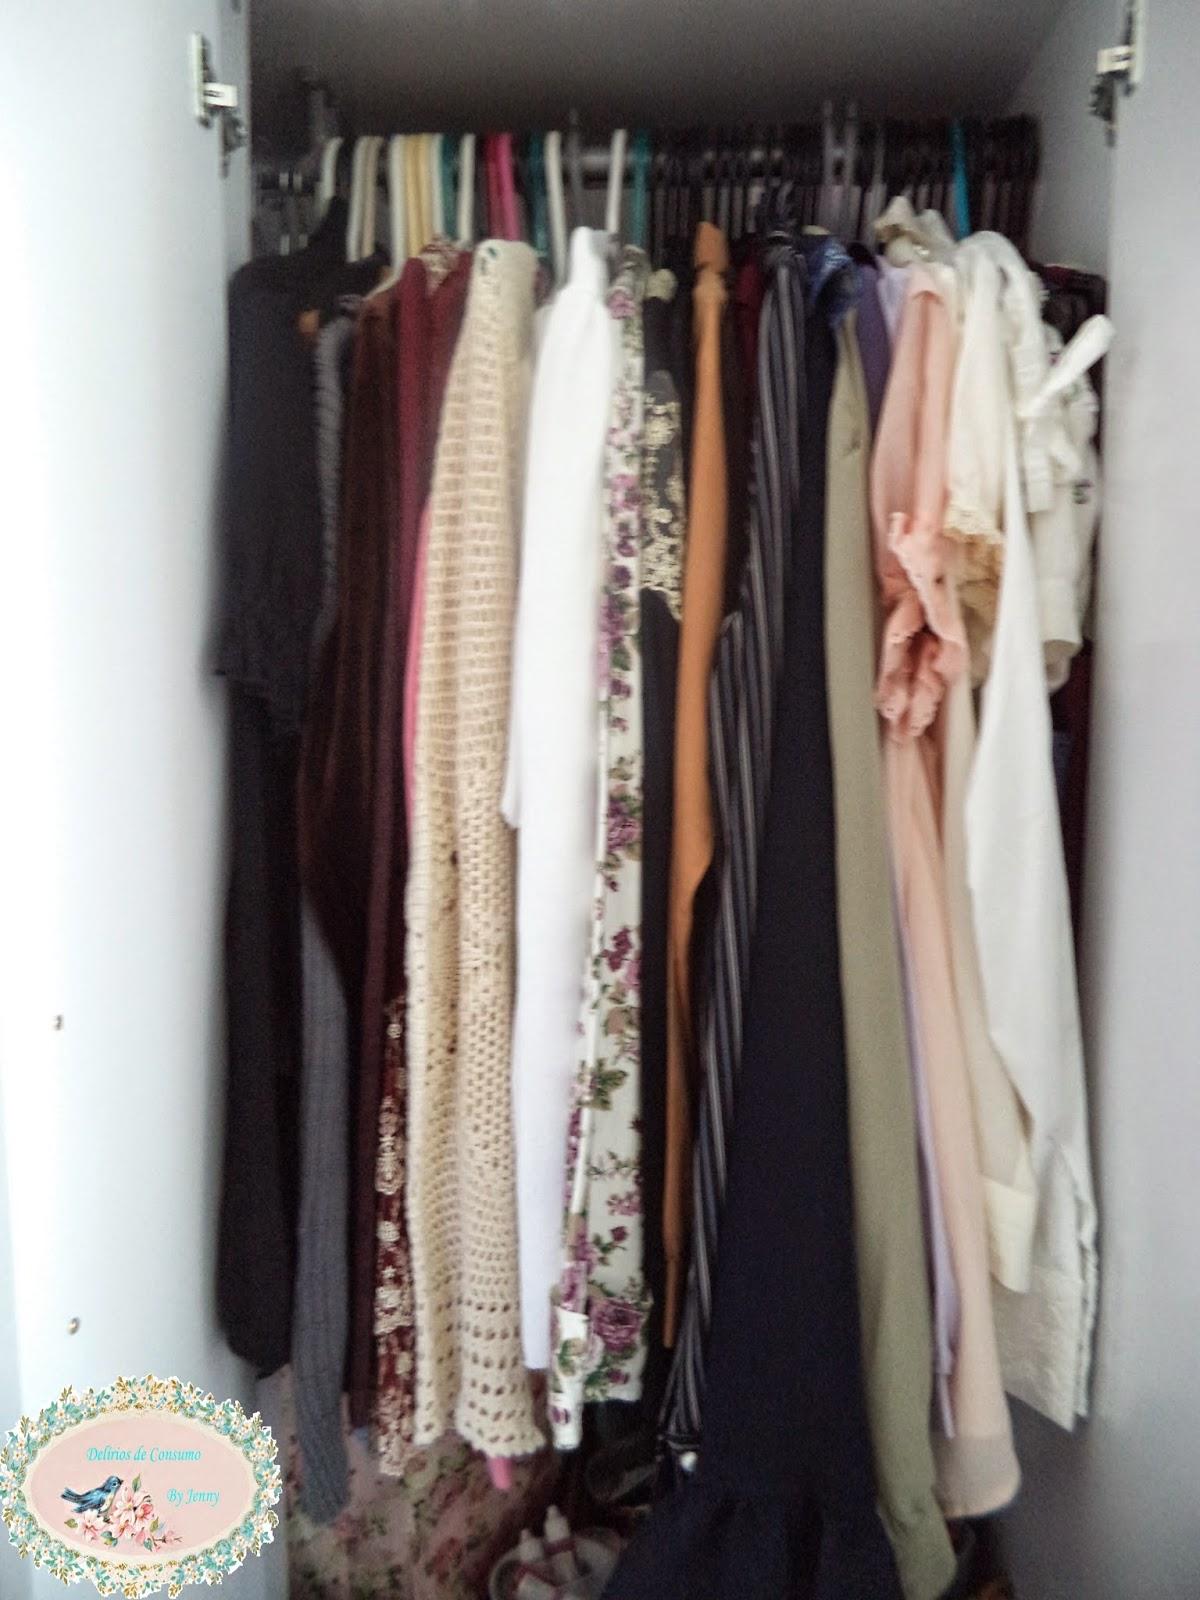 http://deliriosdeconsumismo.blogspot.com.br/p/wardrob.html